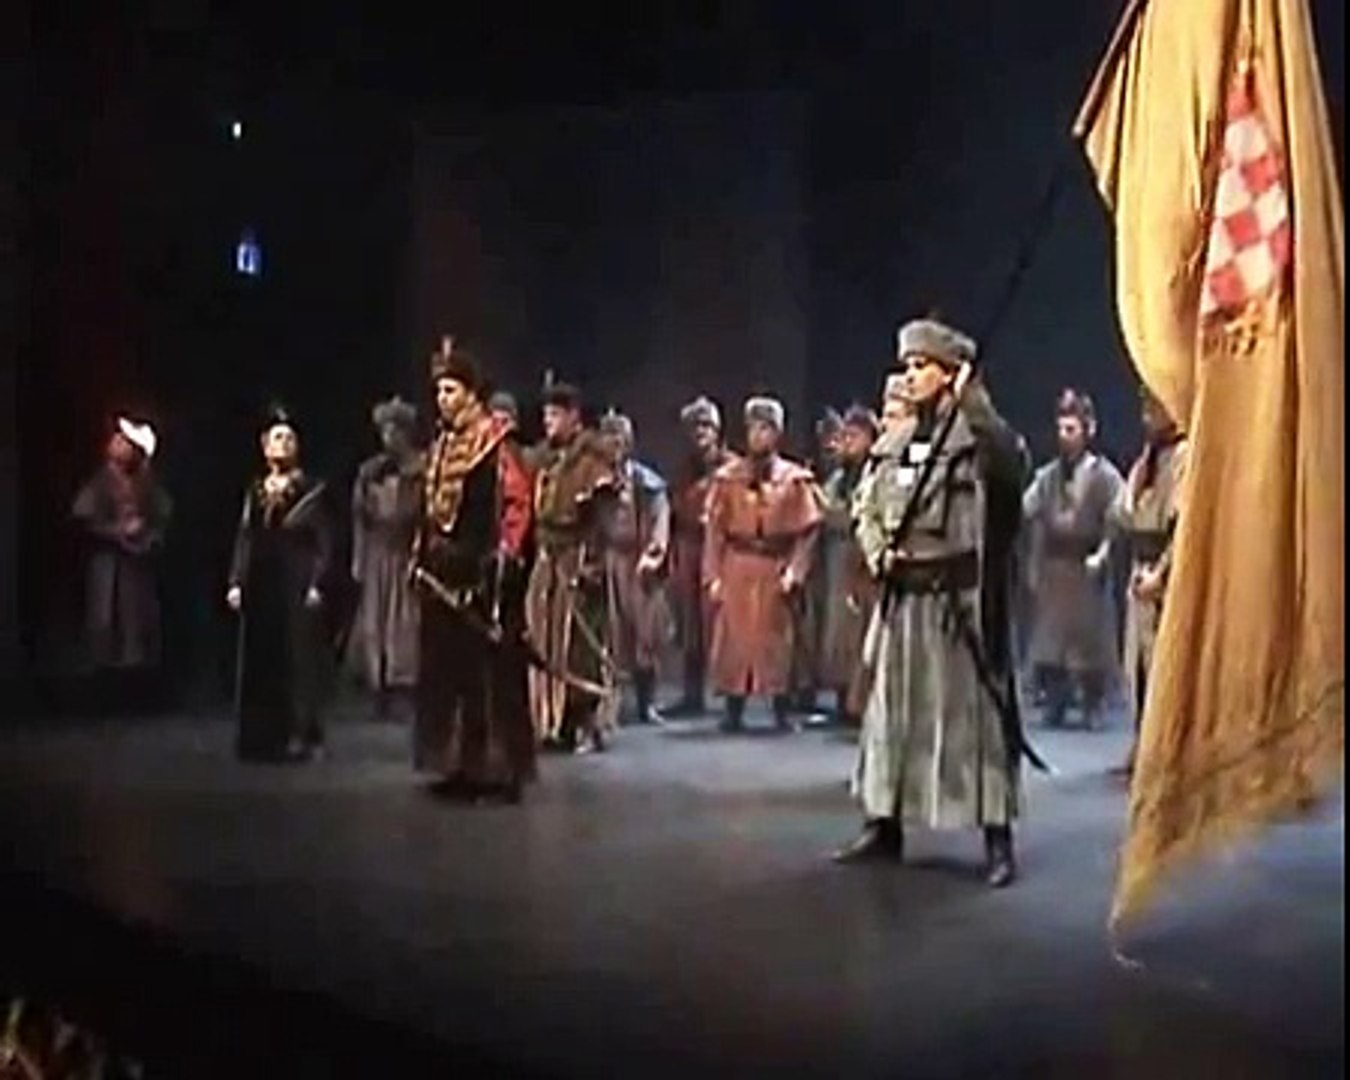 Sasa Jakelic - Nikola Subic Zrinjski - finale U boj